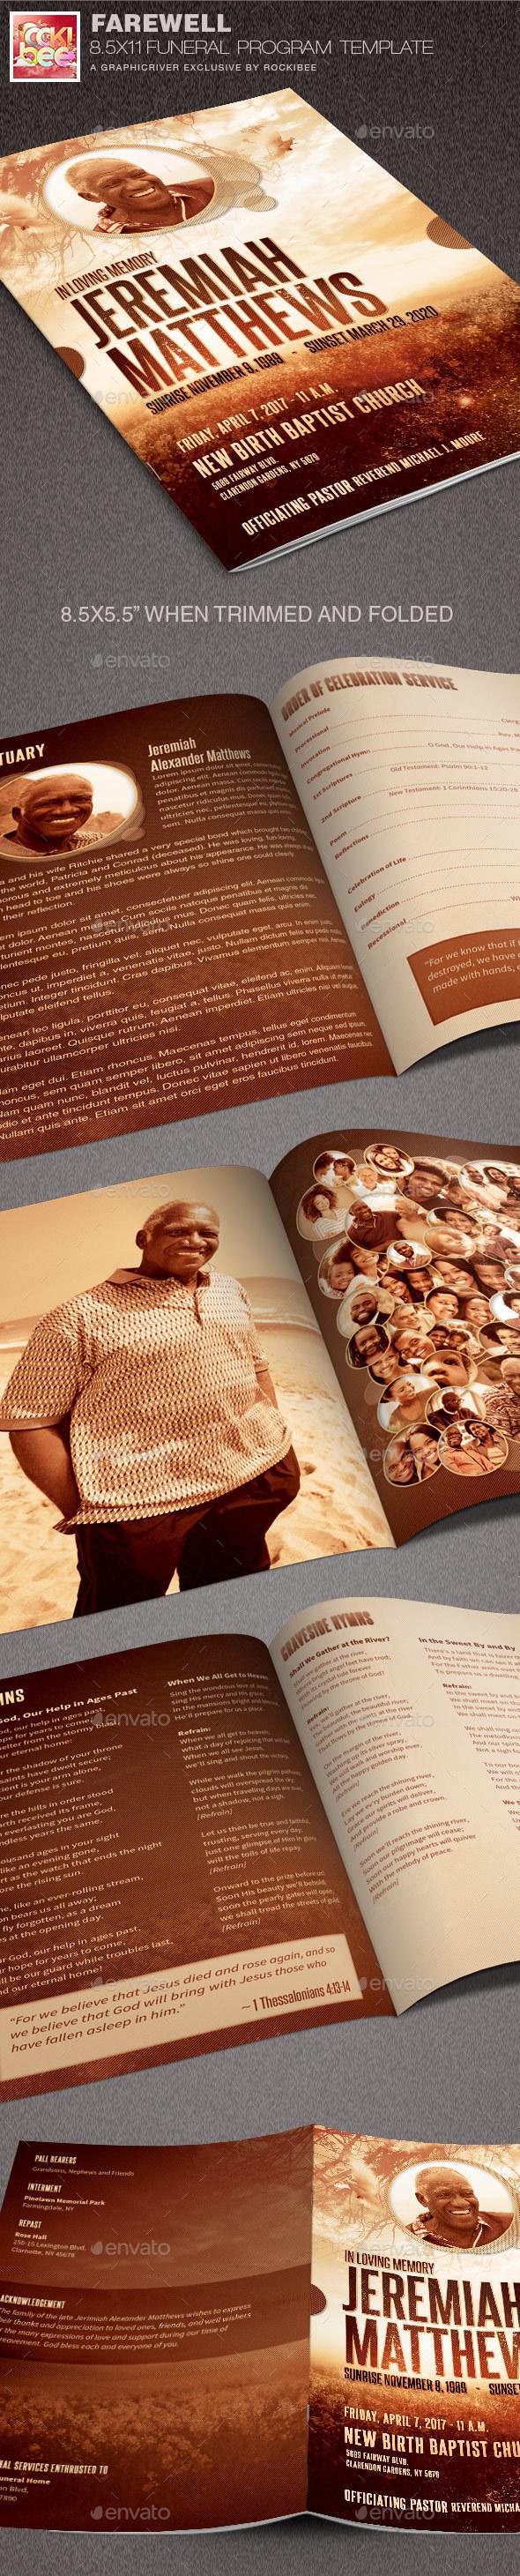 Farewell Funeral Program Template - Informational Brochures